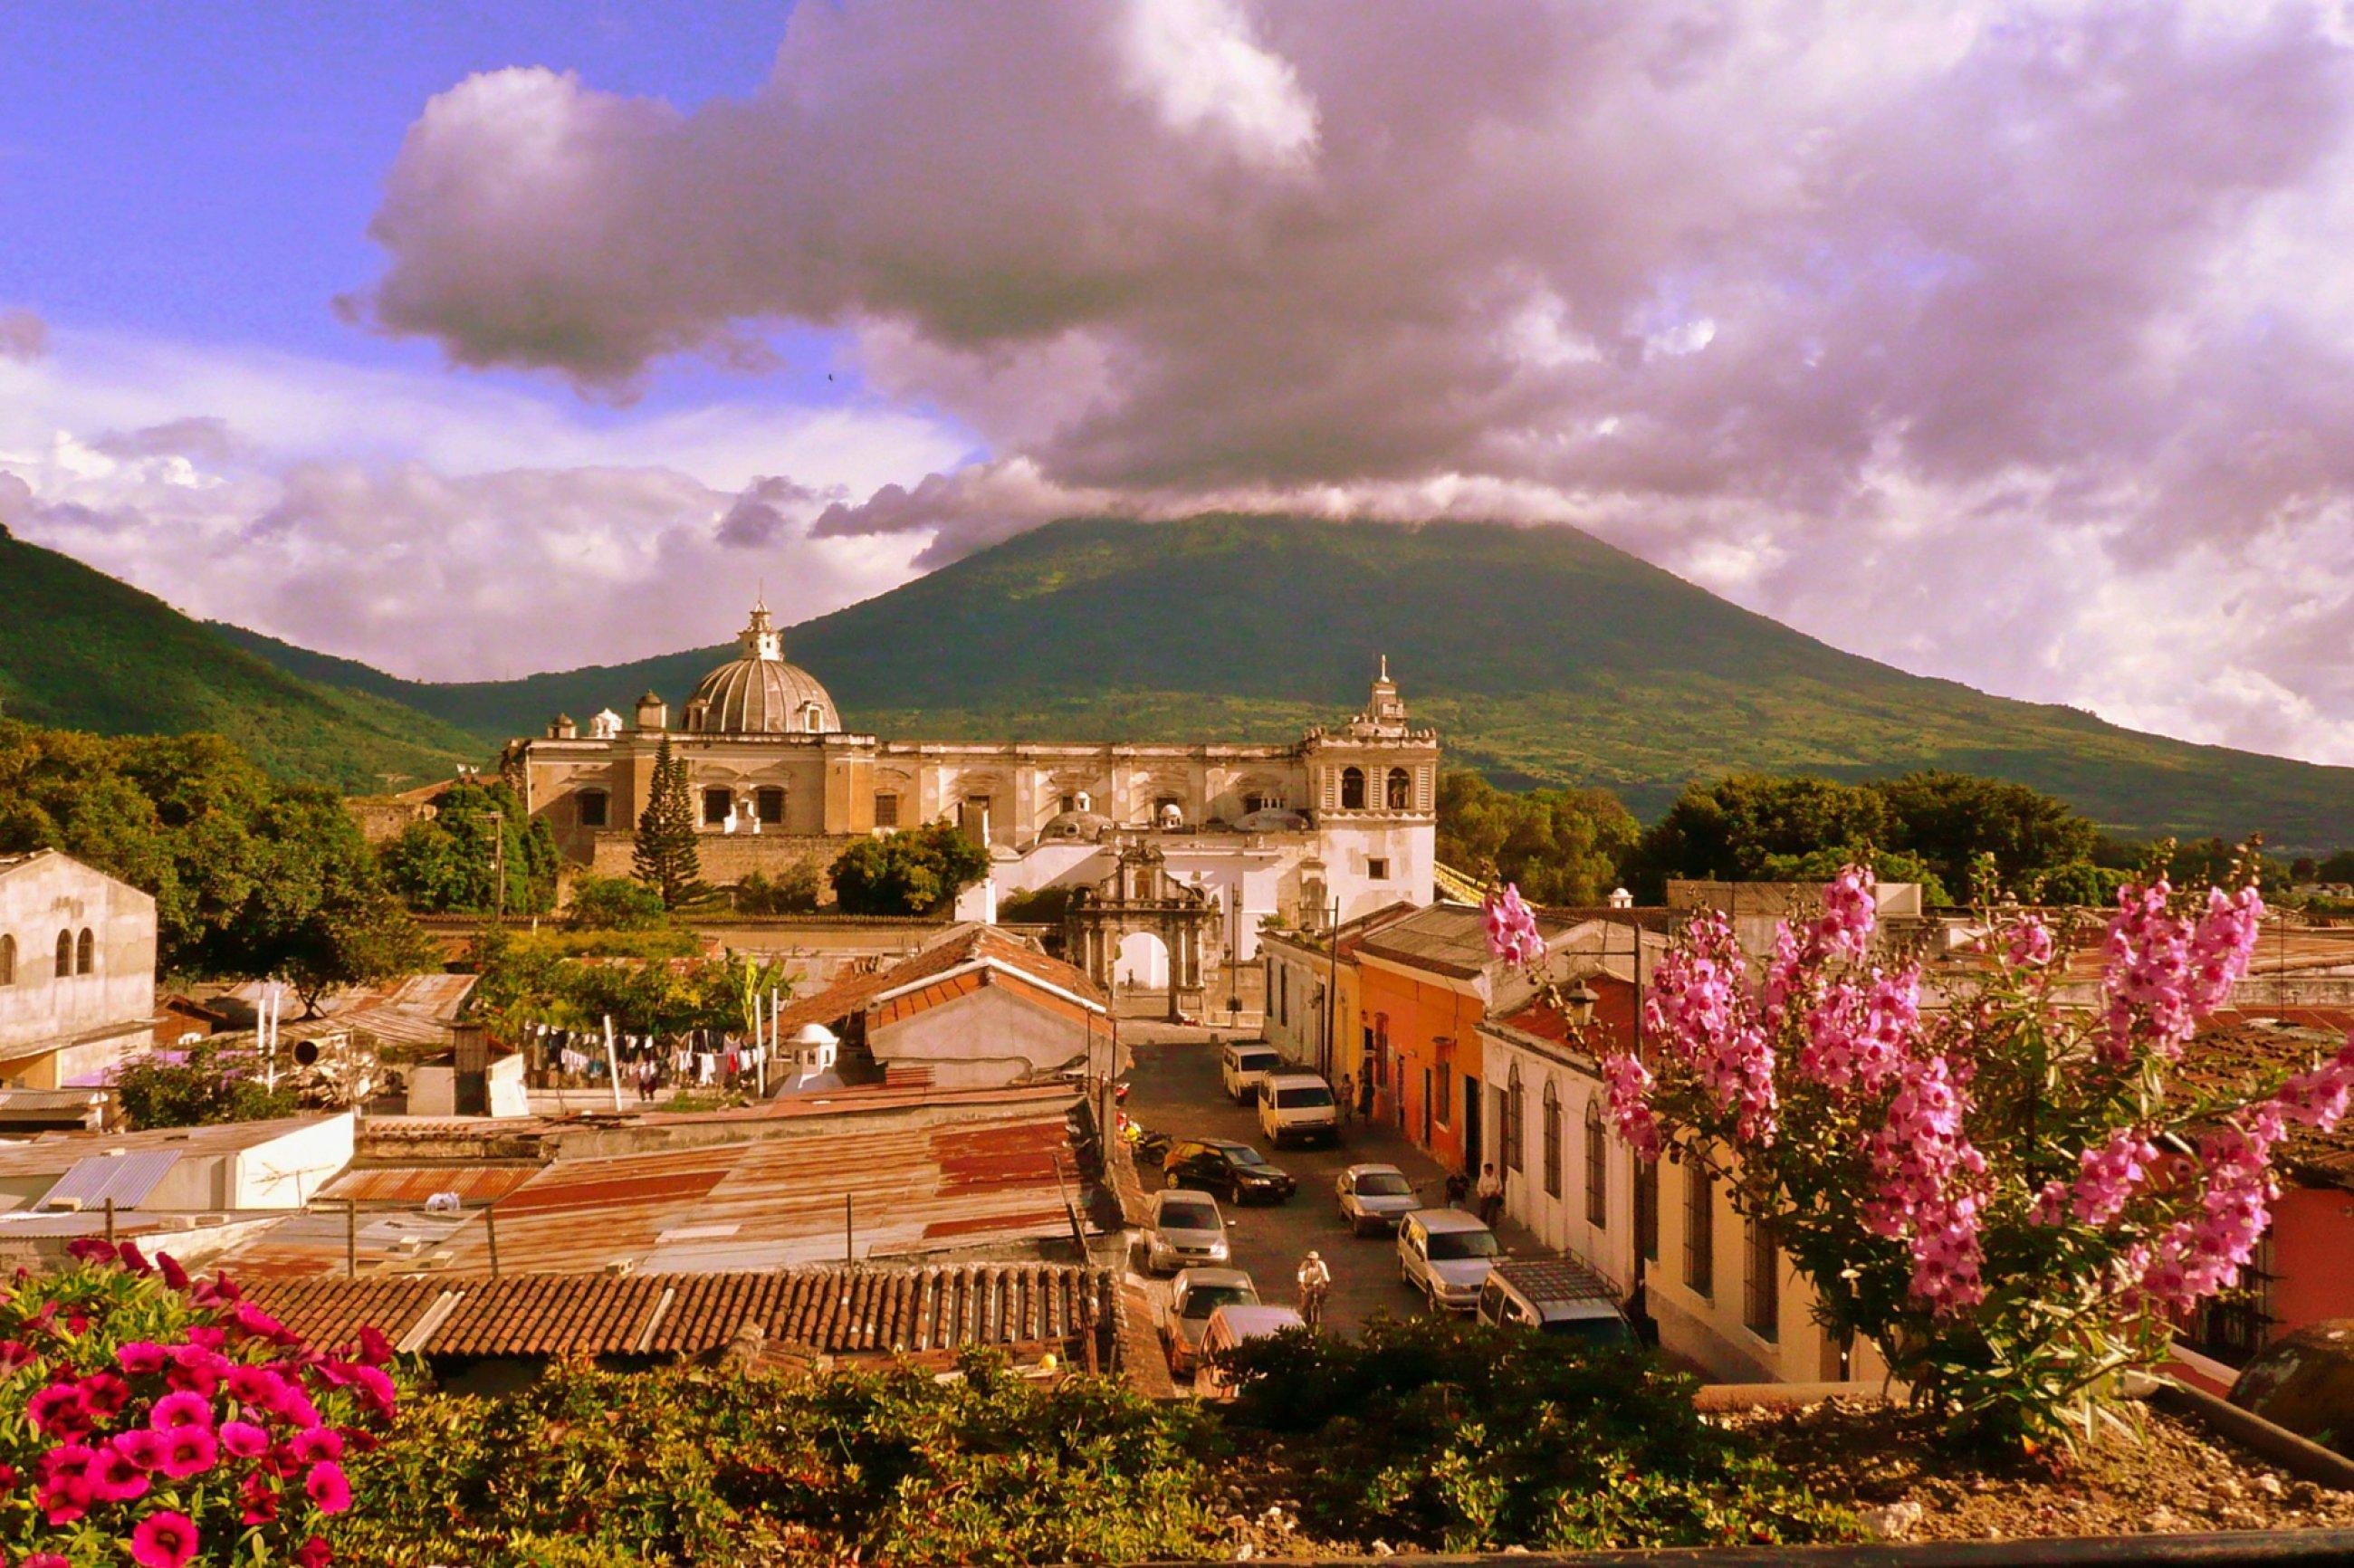 https://bubo.sk/uploads/galleries/7338/san-francisco-church-antigua-guatemala-dreamstime-xl-12348942.jpg